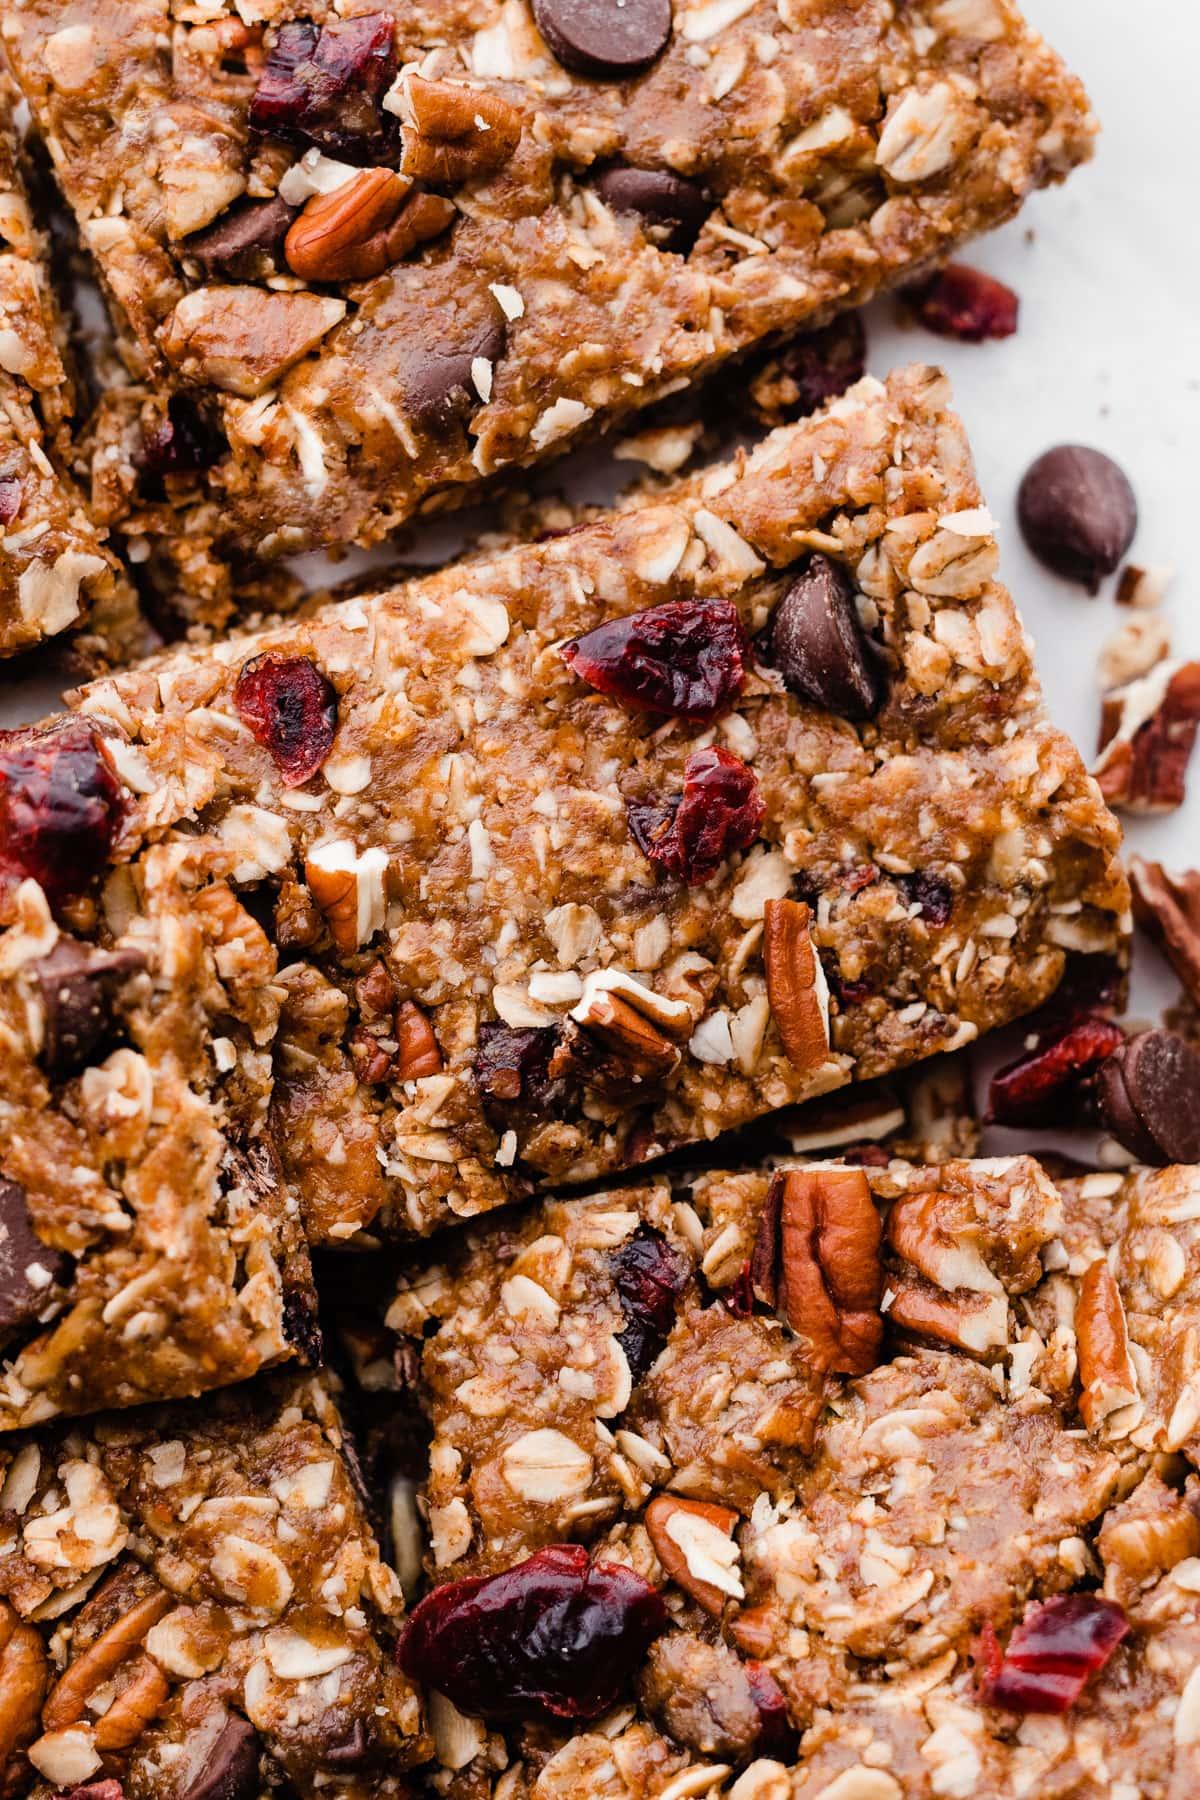 Salted Chocolate Almond No Bake Granola Bars. Healthy, gluten free granola bar recipe